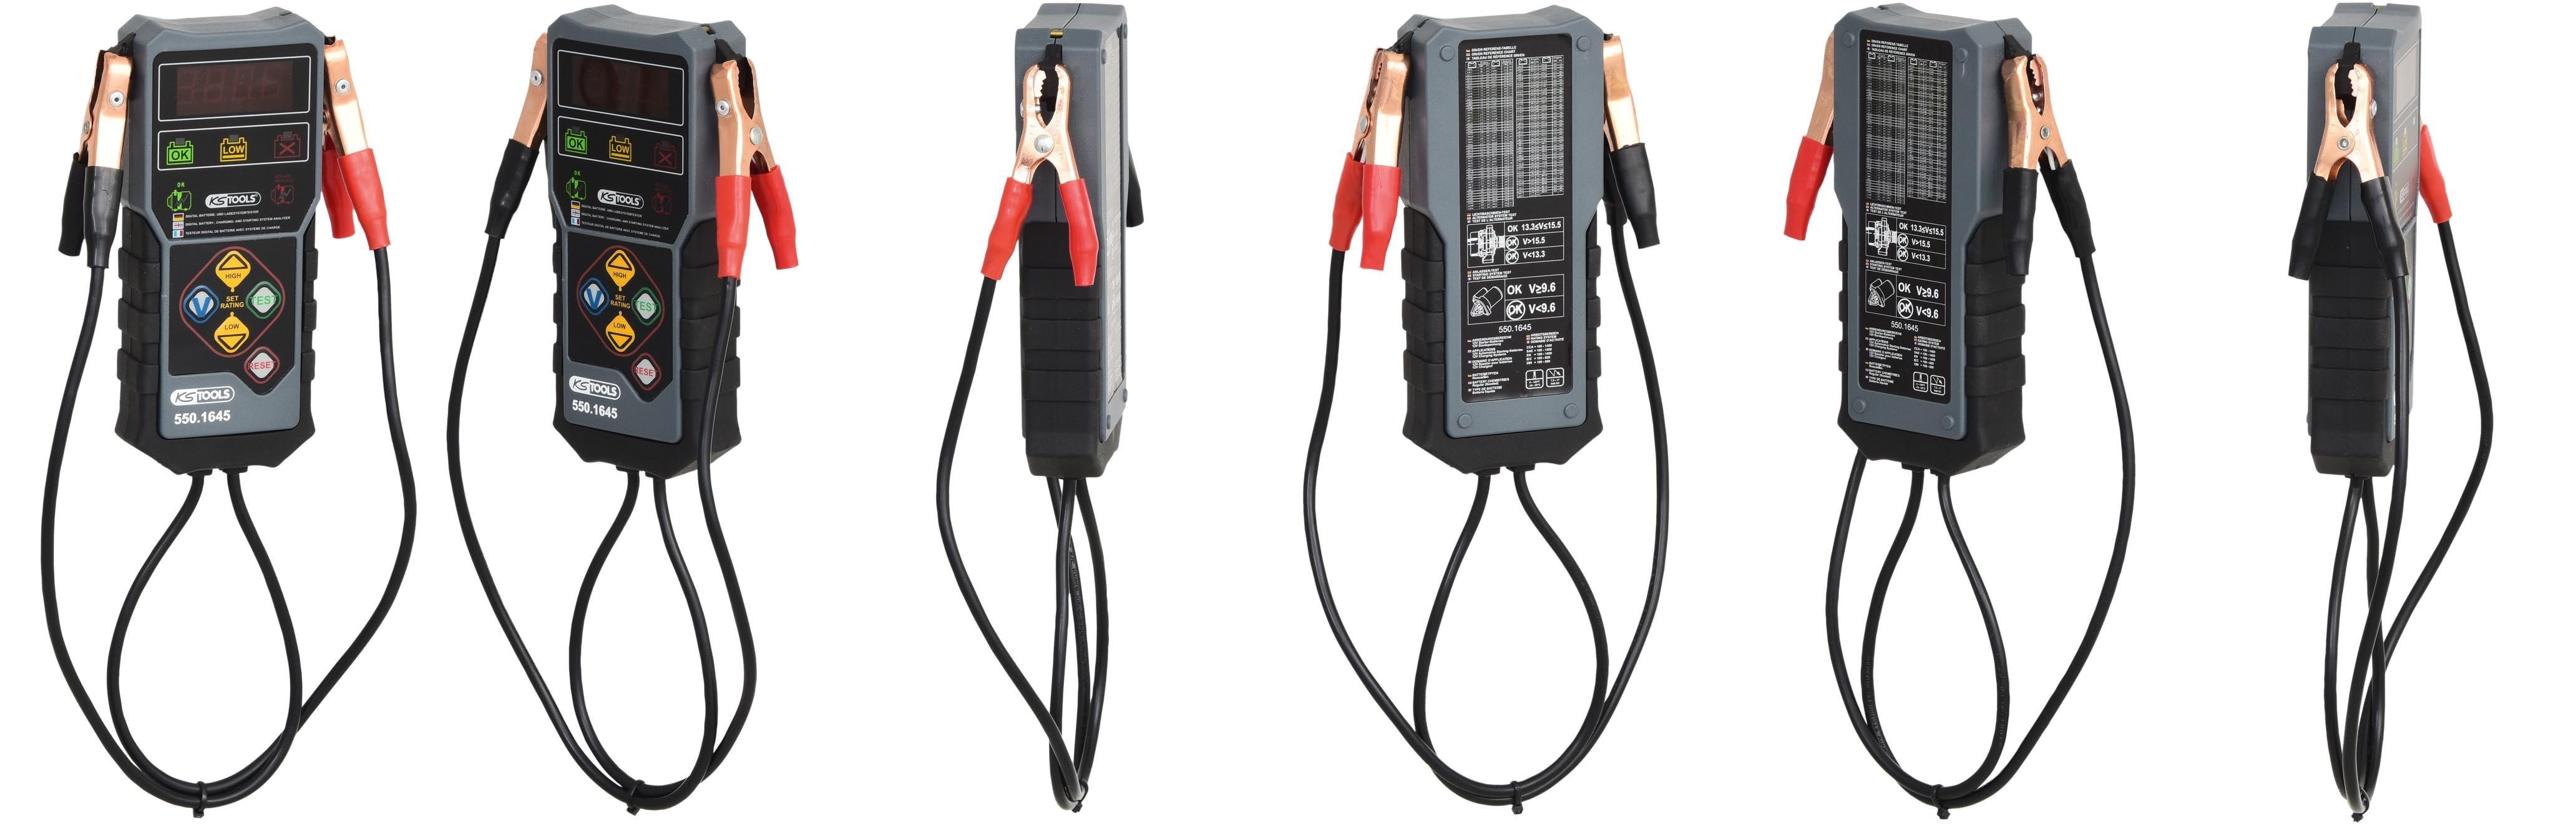 Ks Tools 550 1645 12v Digital Batterietester Gewerbe Industrie Wissenschaft